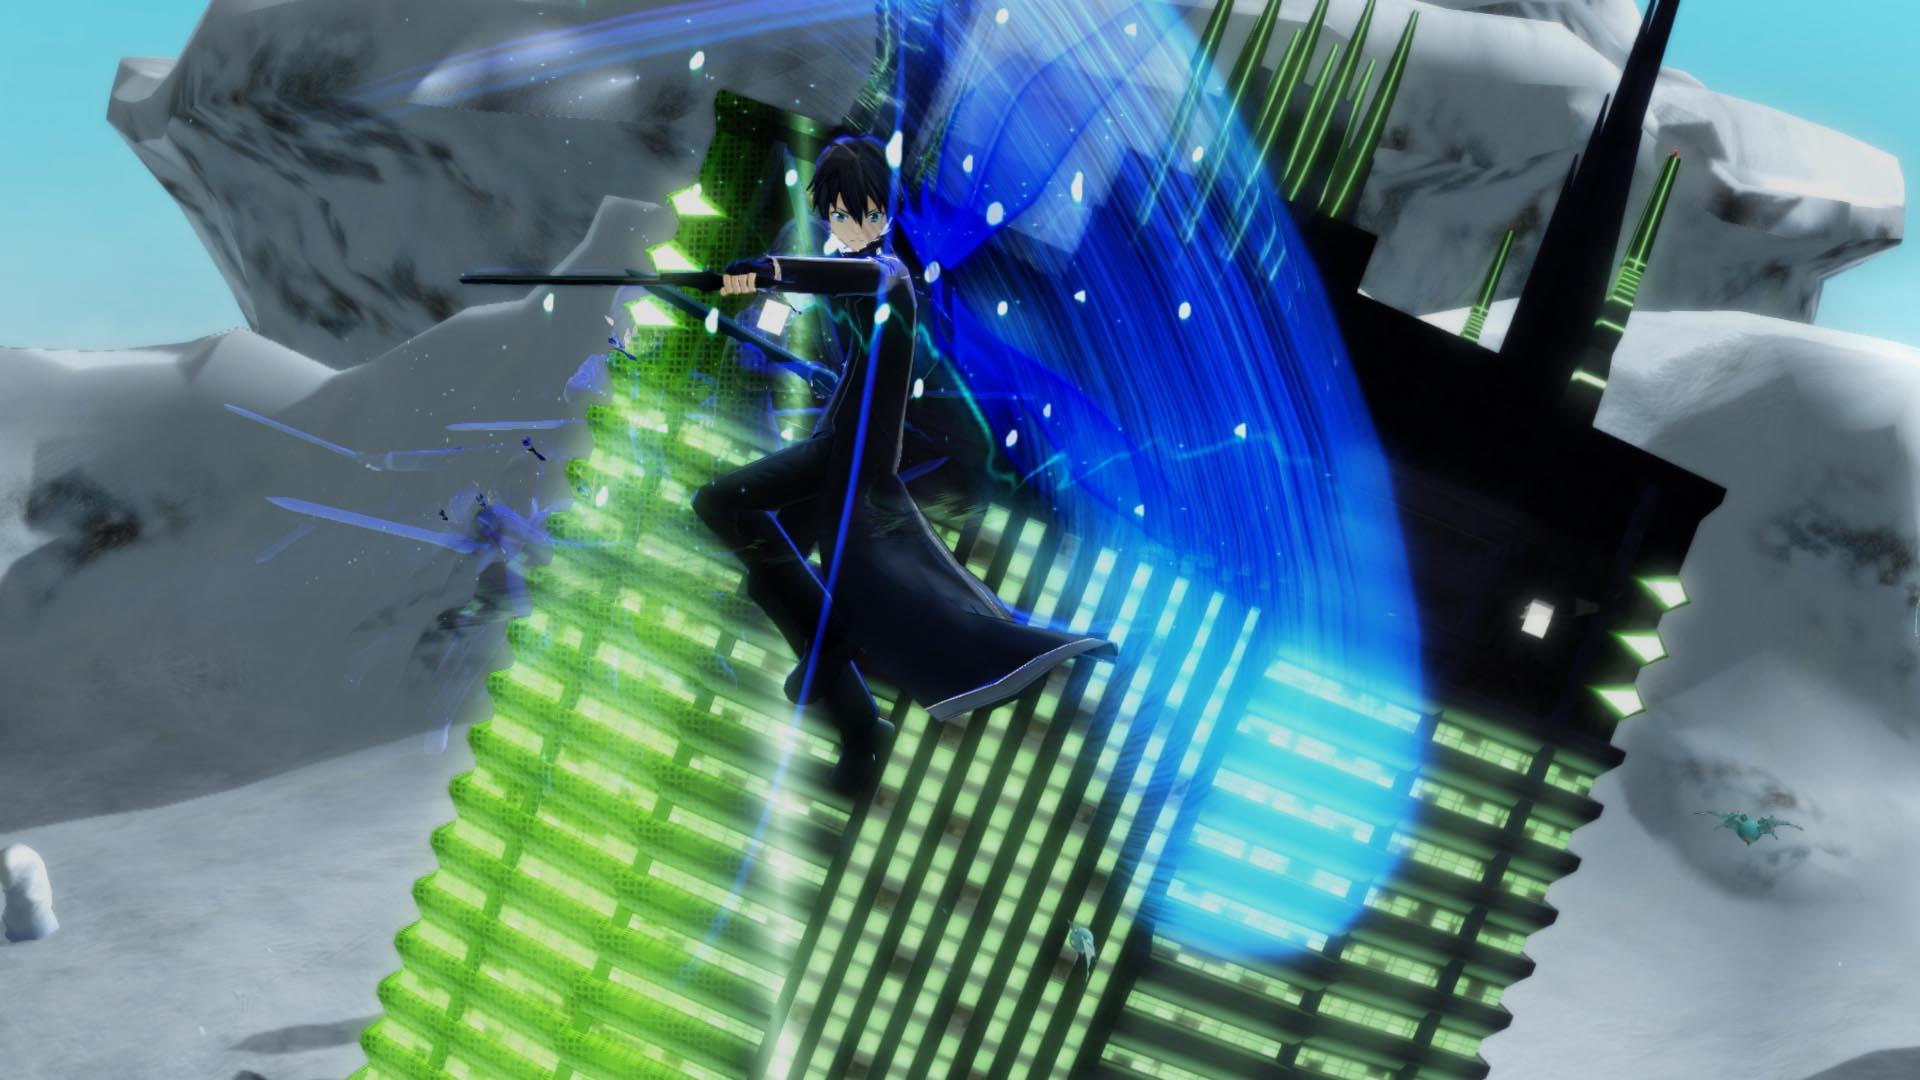 KHAiHOM.com - Accel World VS. Sword Art Online Deluxe Edition